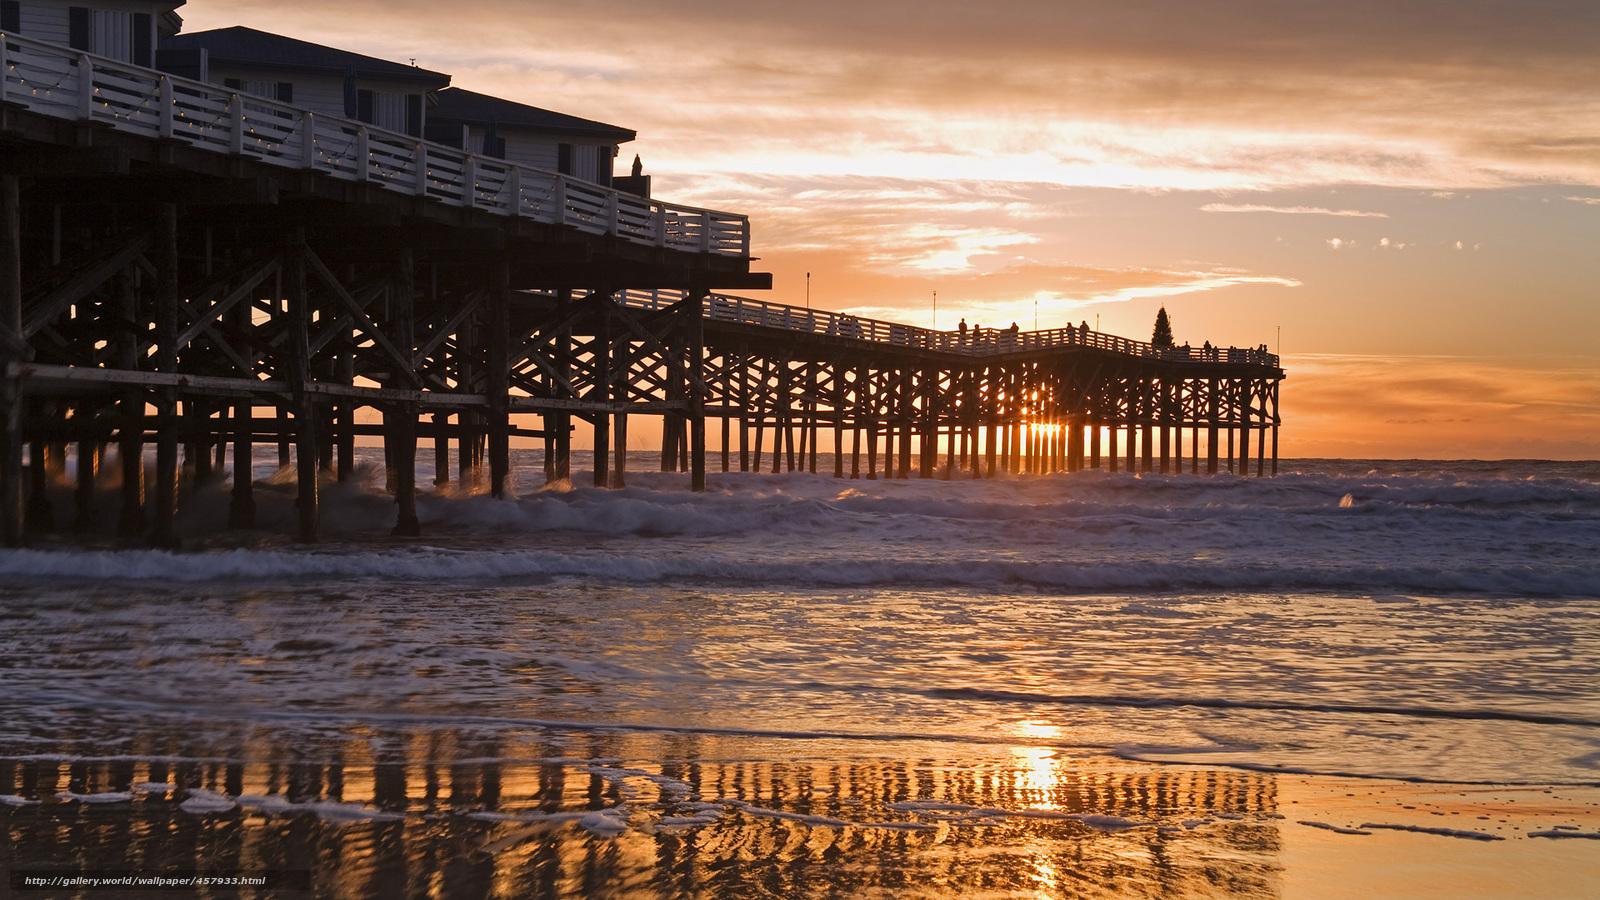 Download wallpaper pier california beach san diego free for Pier fishing san diego